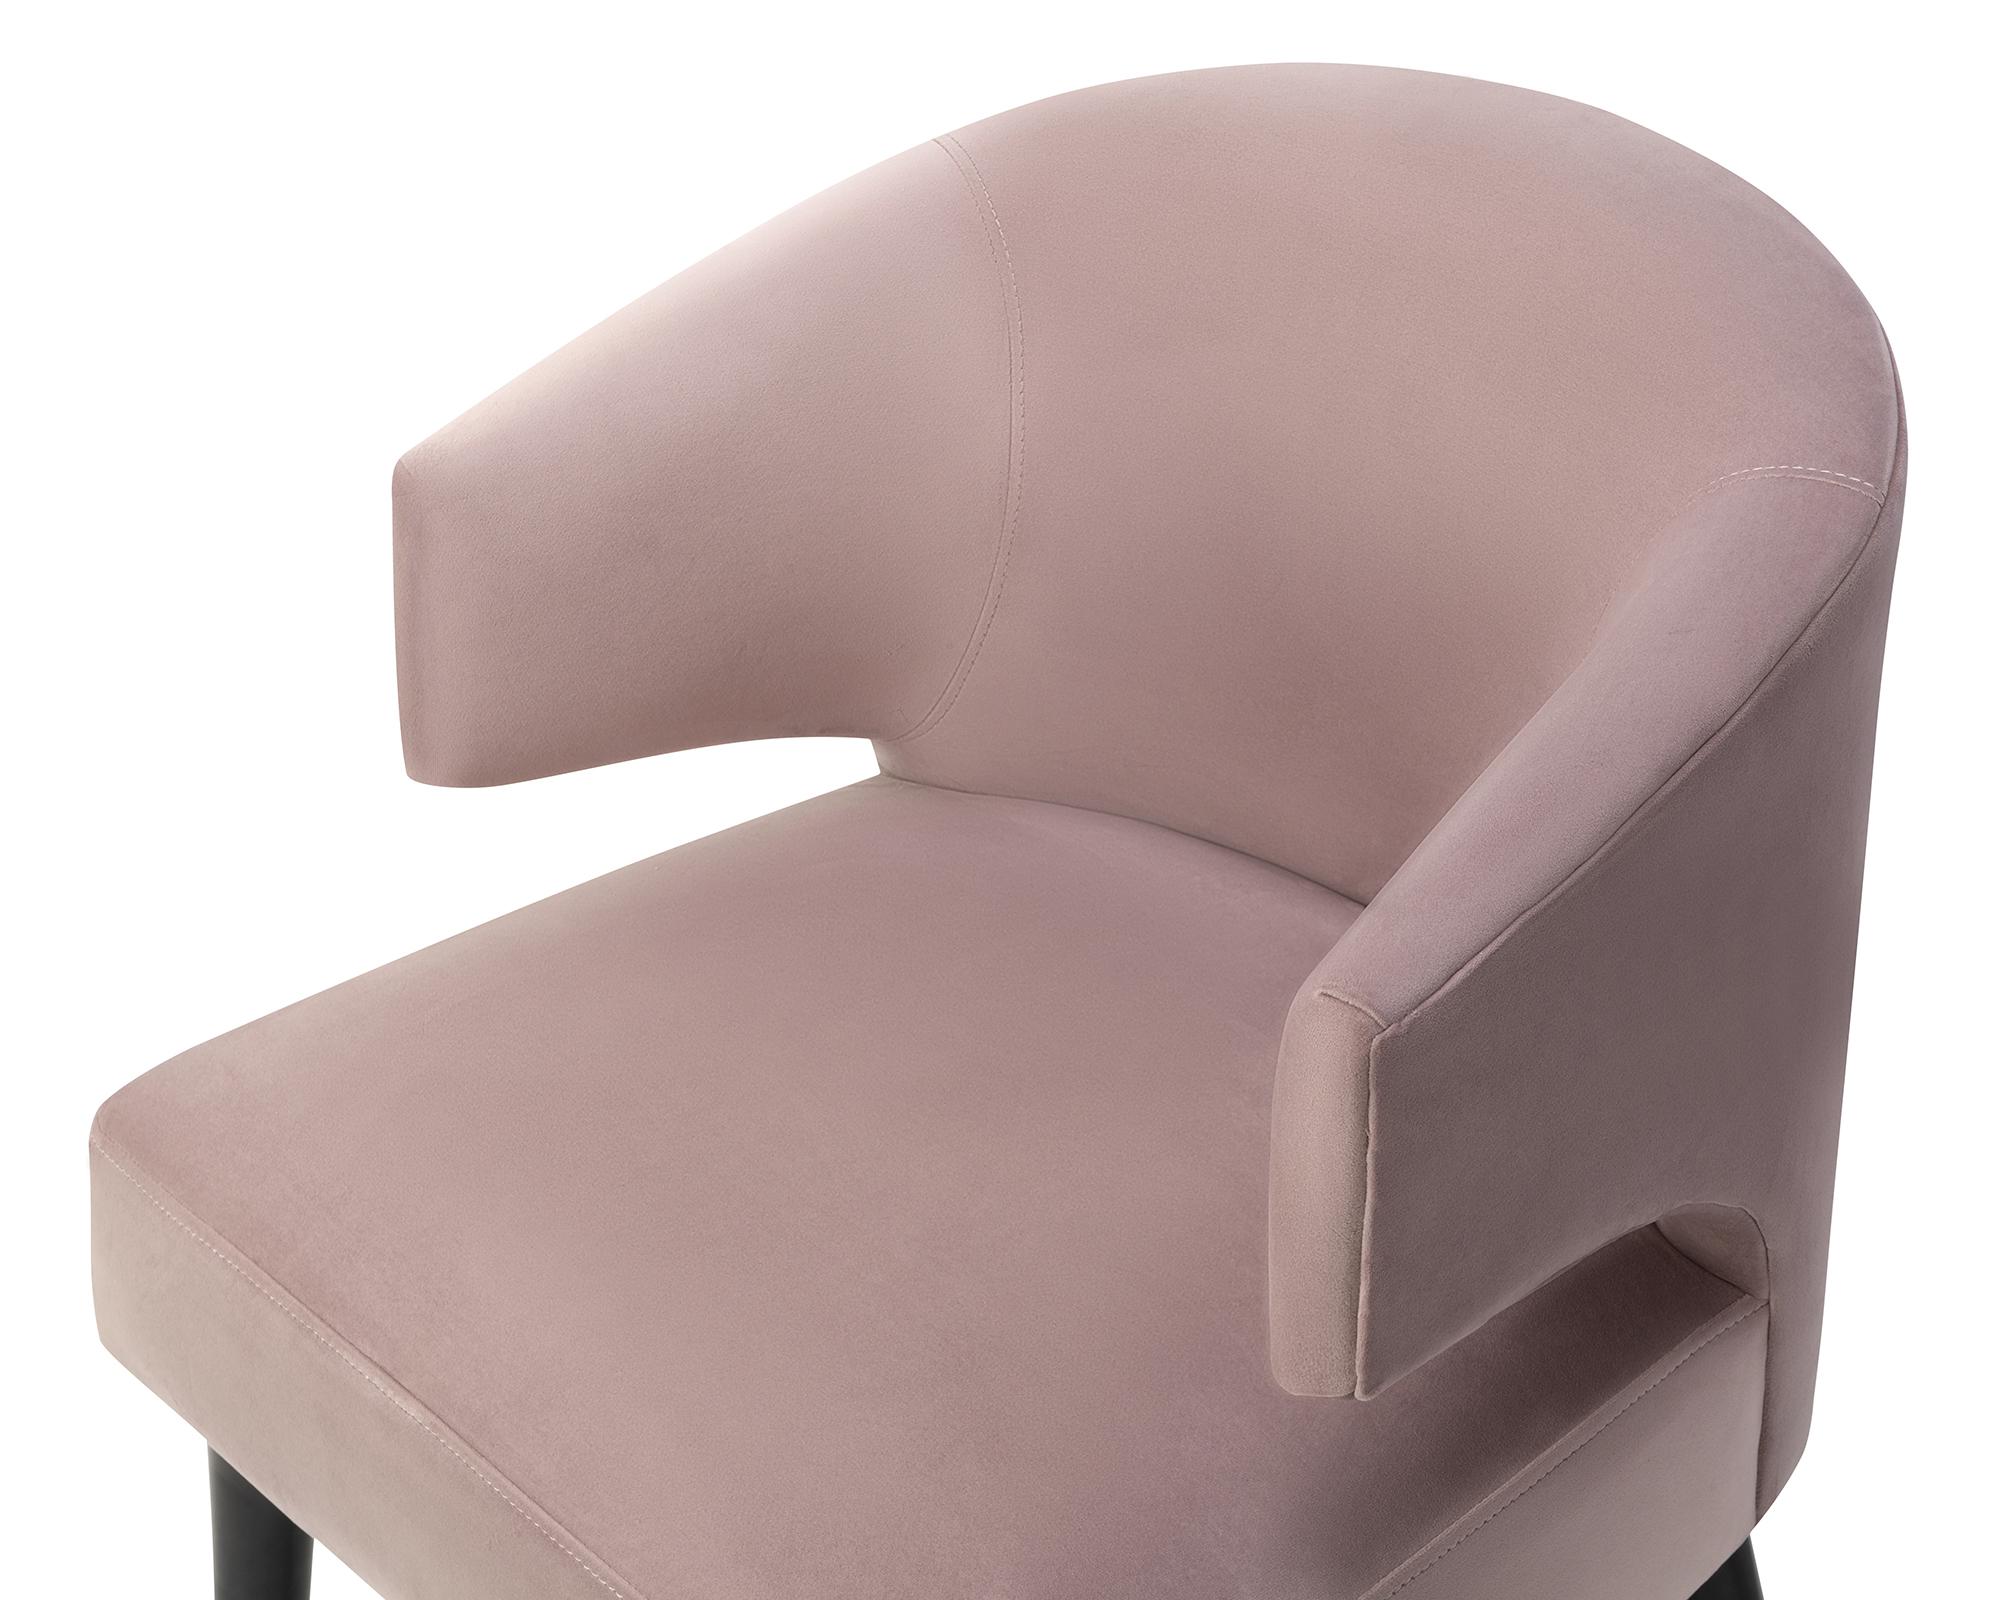 Liang & Eimil Mia Dining Chair Lilac Velvet BH-DCH-140 (6)